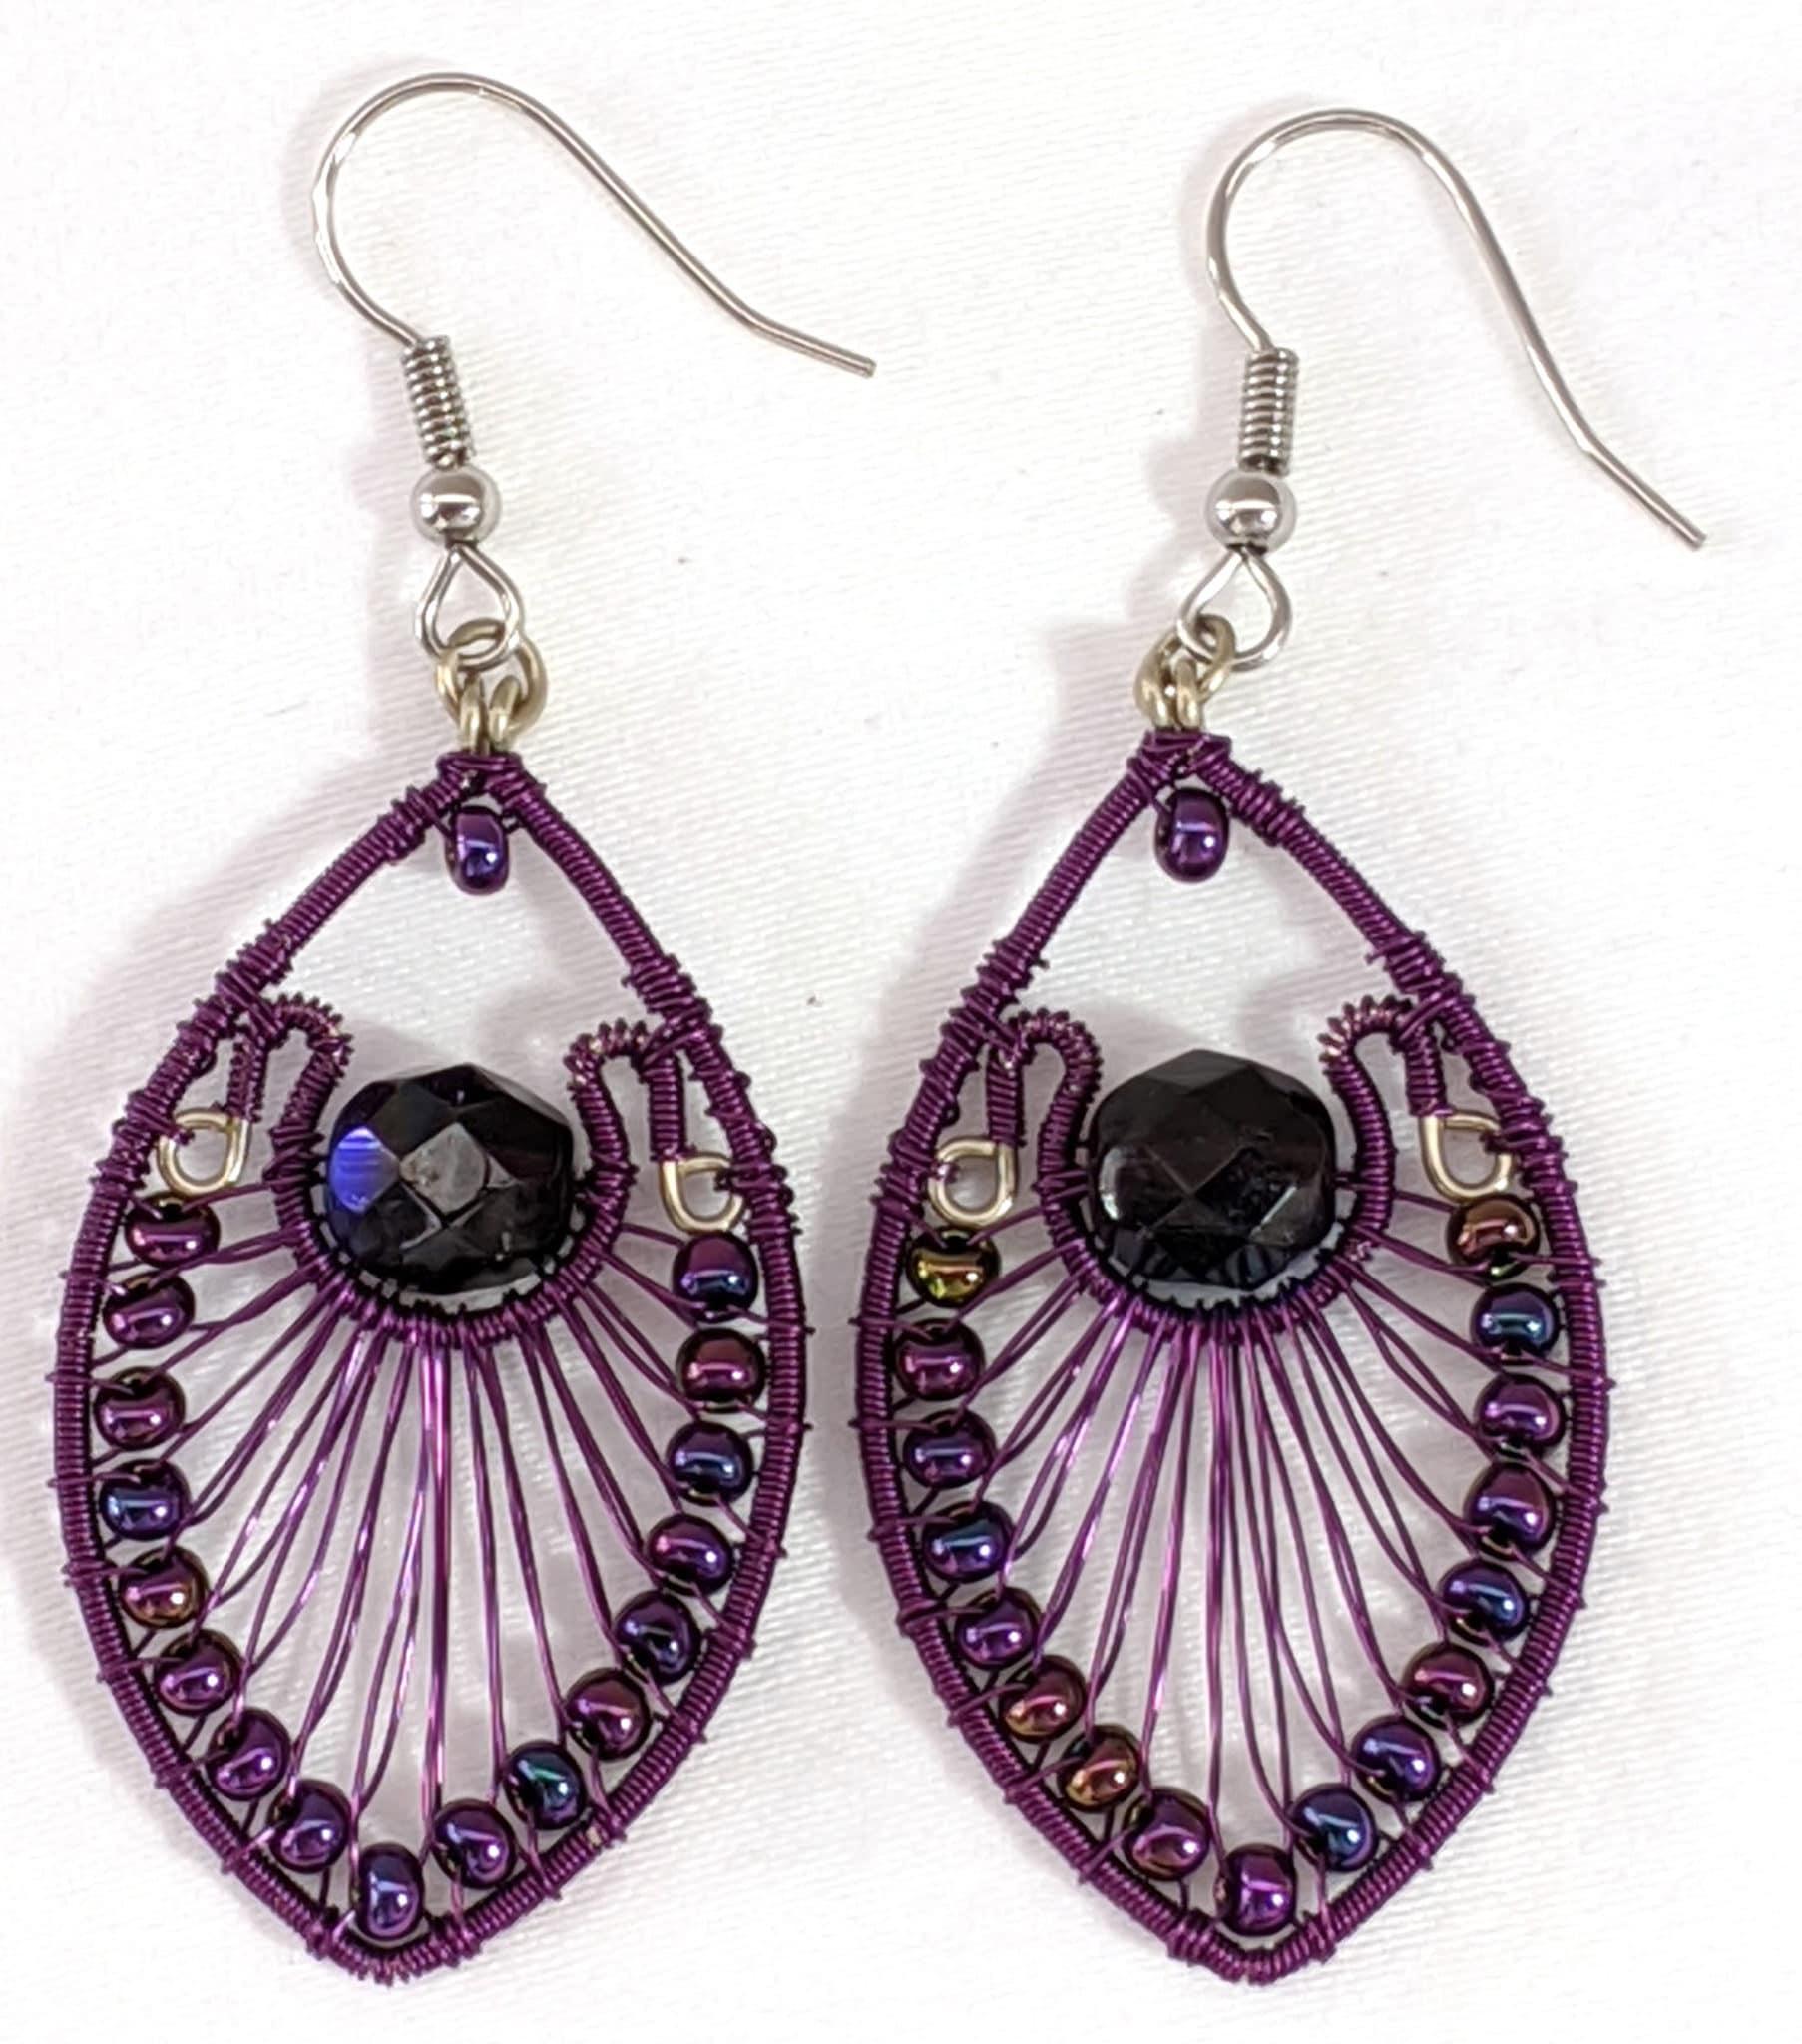 Peacock Earrings - Purple